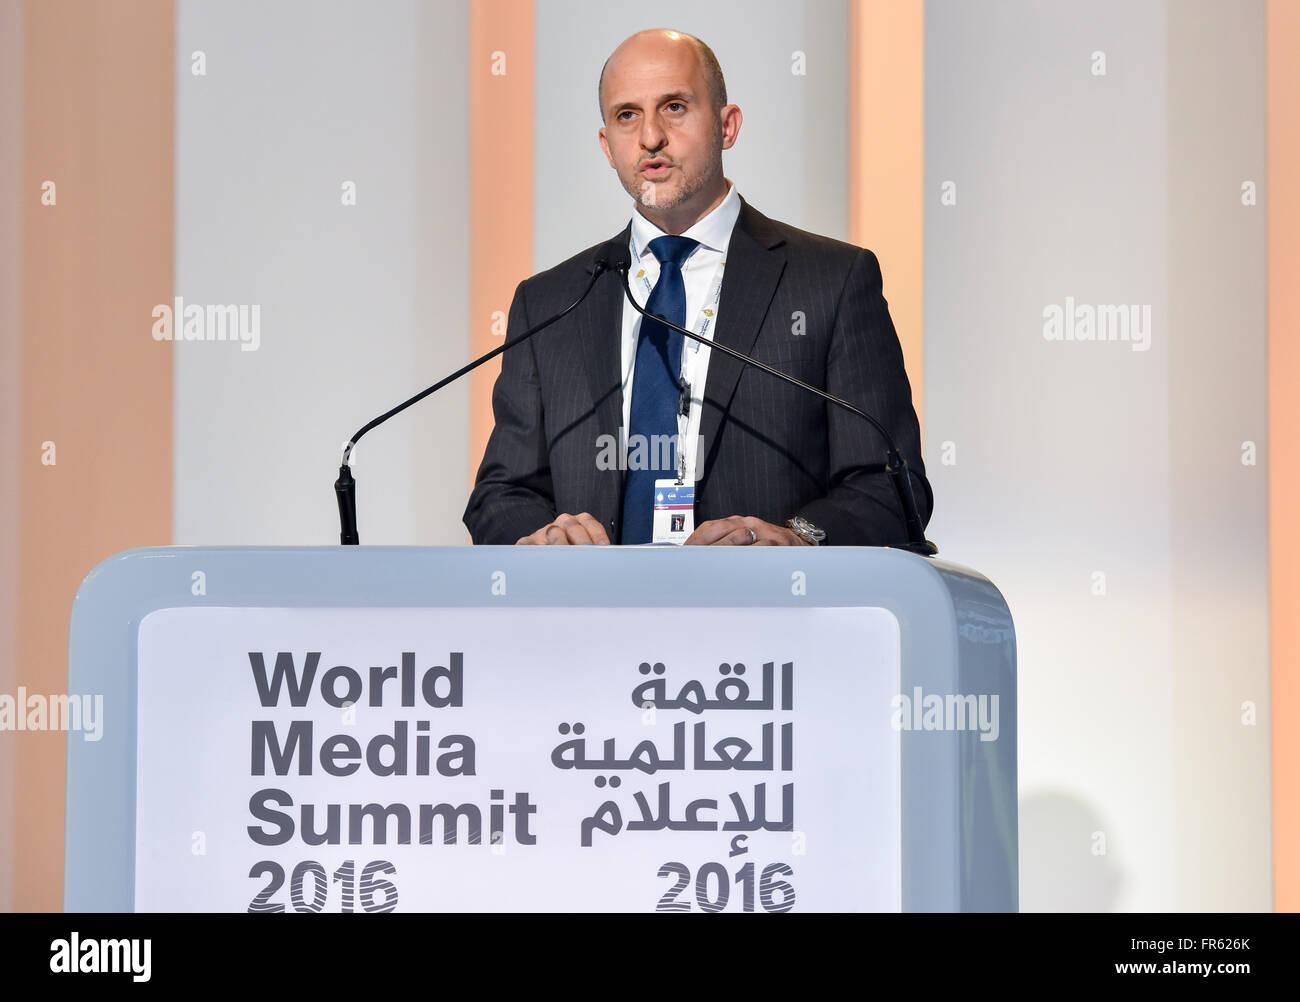 Doha, Qatar. 21st Mar, 2016. Arafat Shoukri, Manager of the Executive Committee of the World Media Summit Doha, - Stock Image